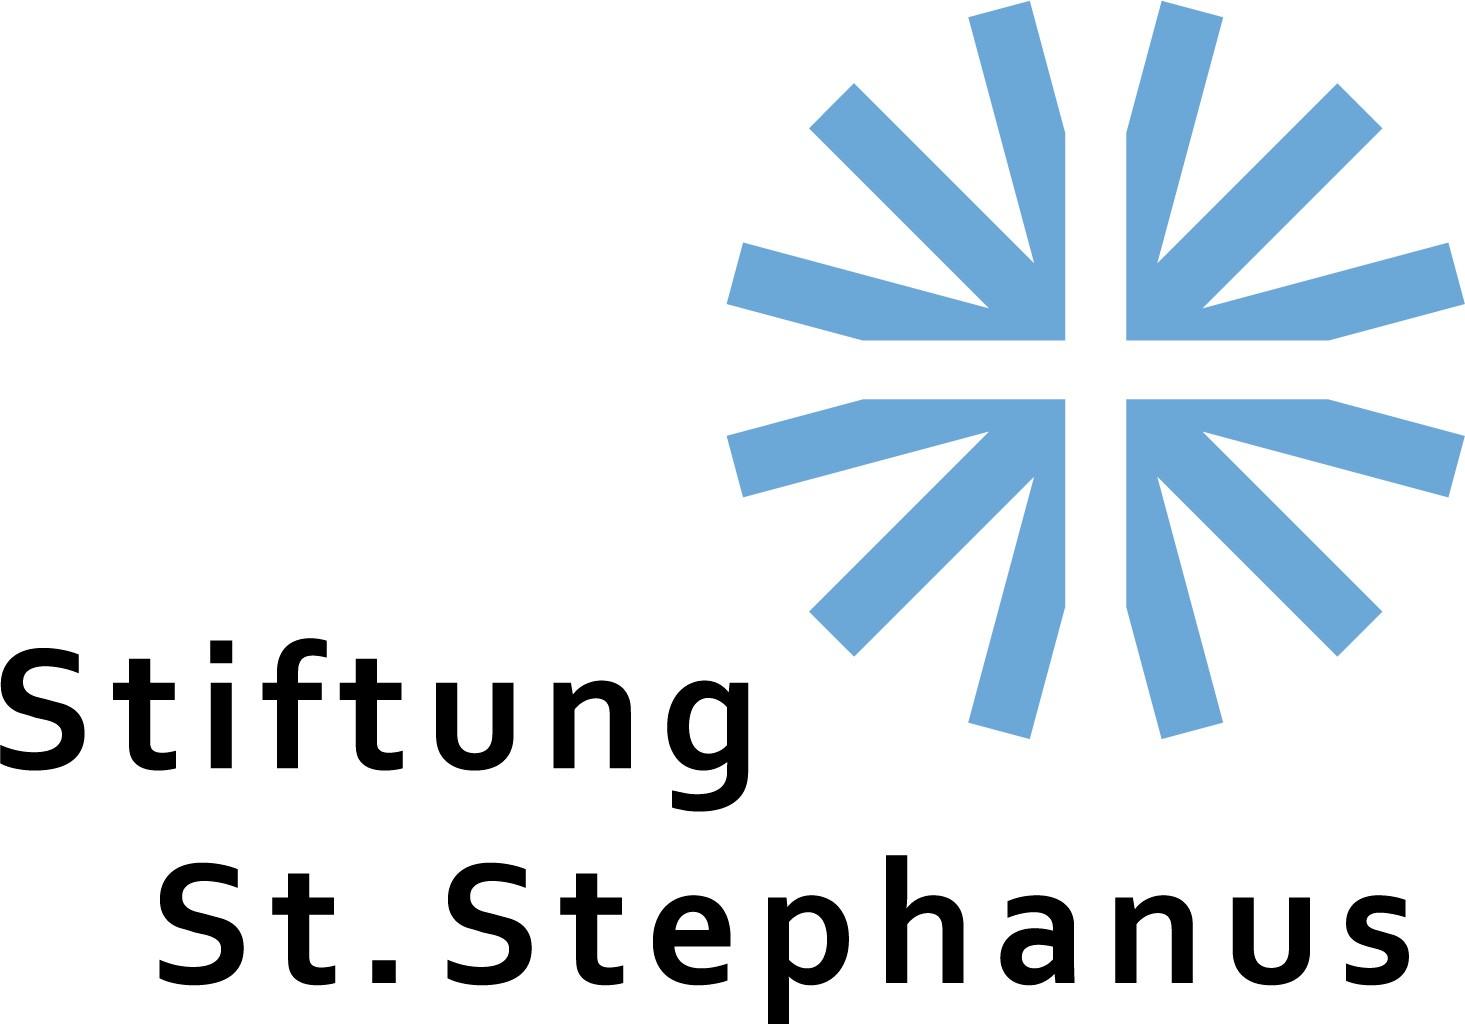 Stiftung St. Stephanus